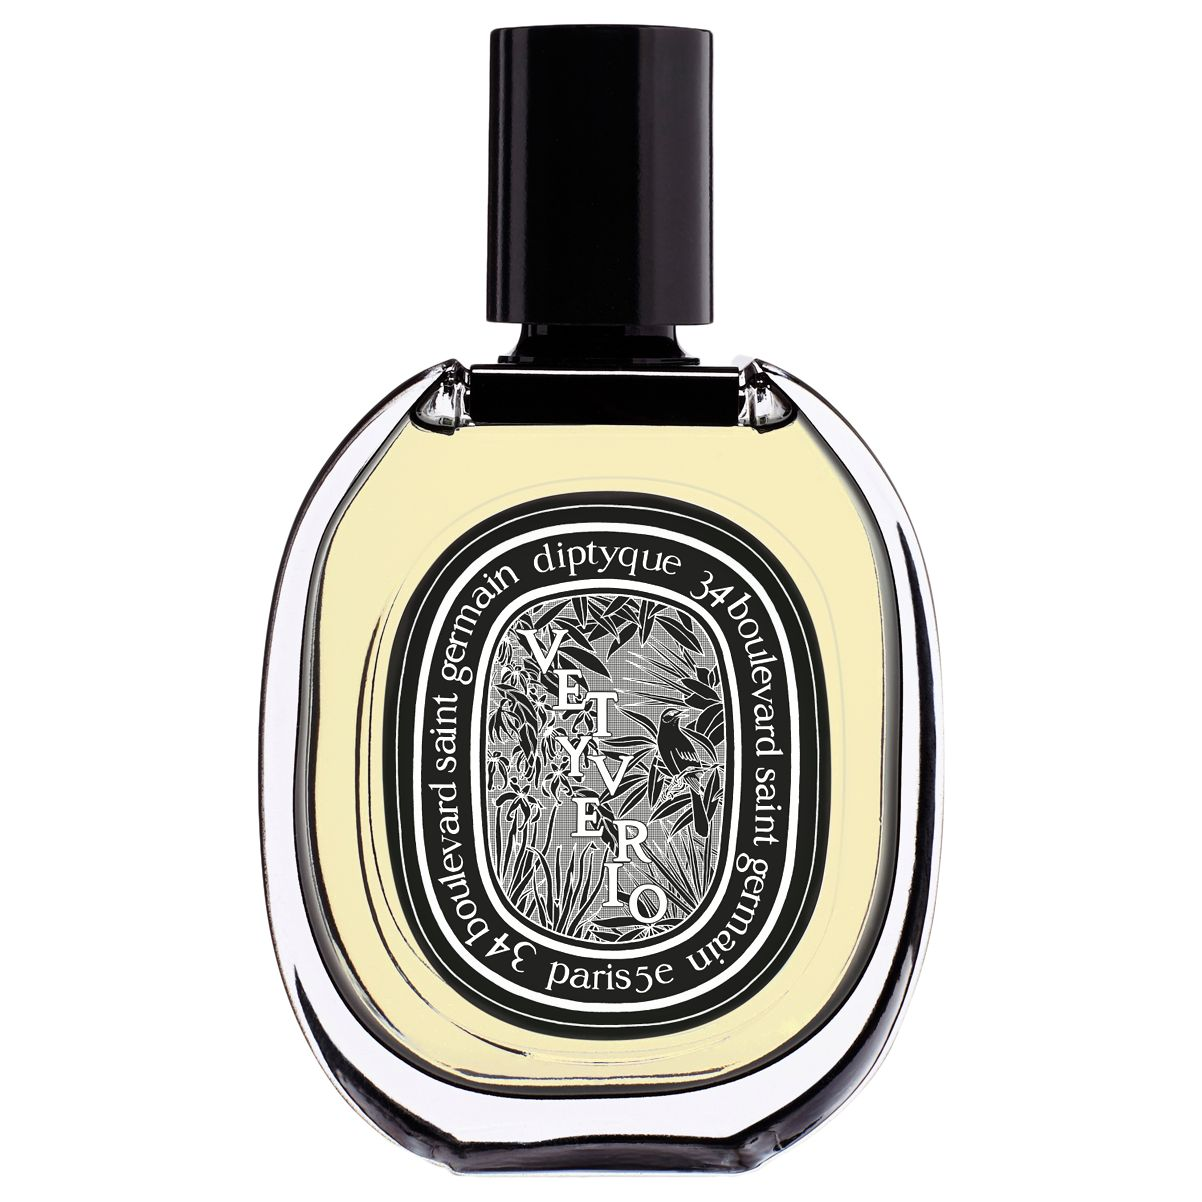 Diptyque Diptyque Vetyverio Eau de Parfum, 75ml